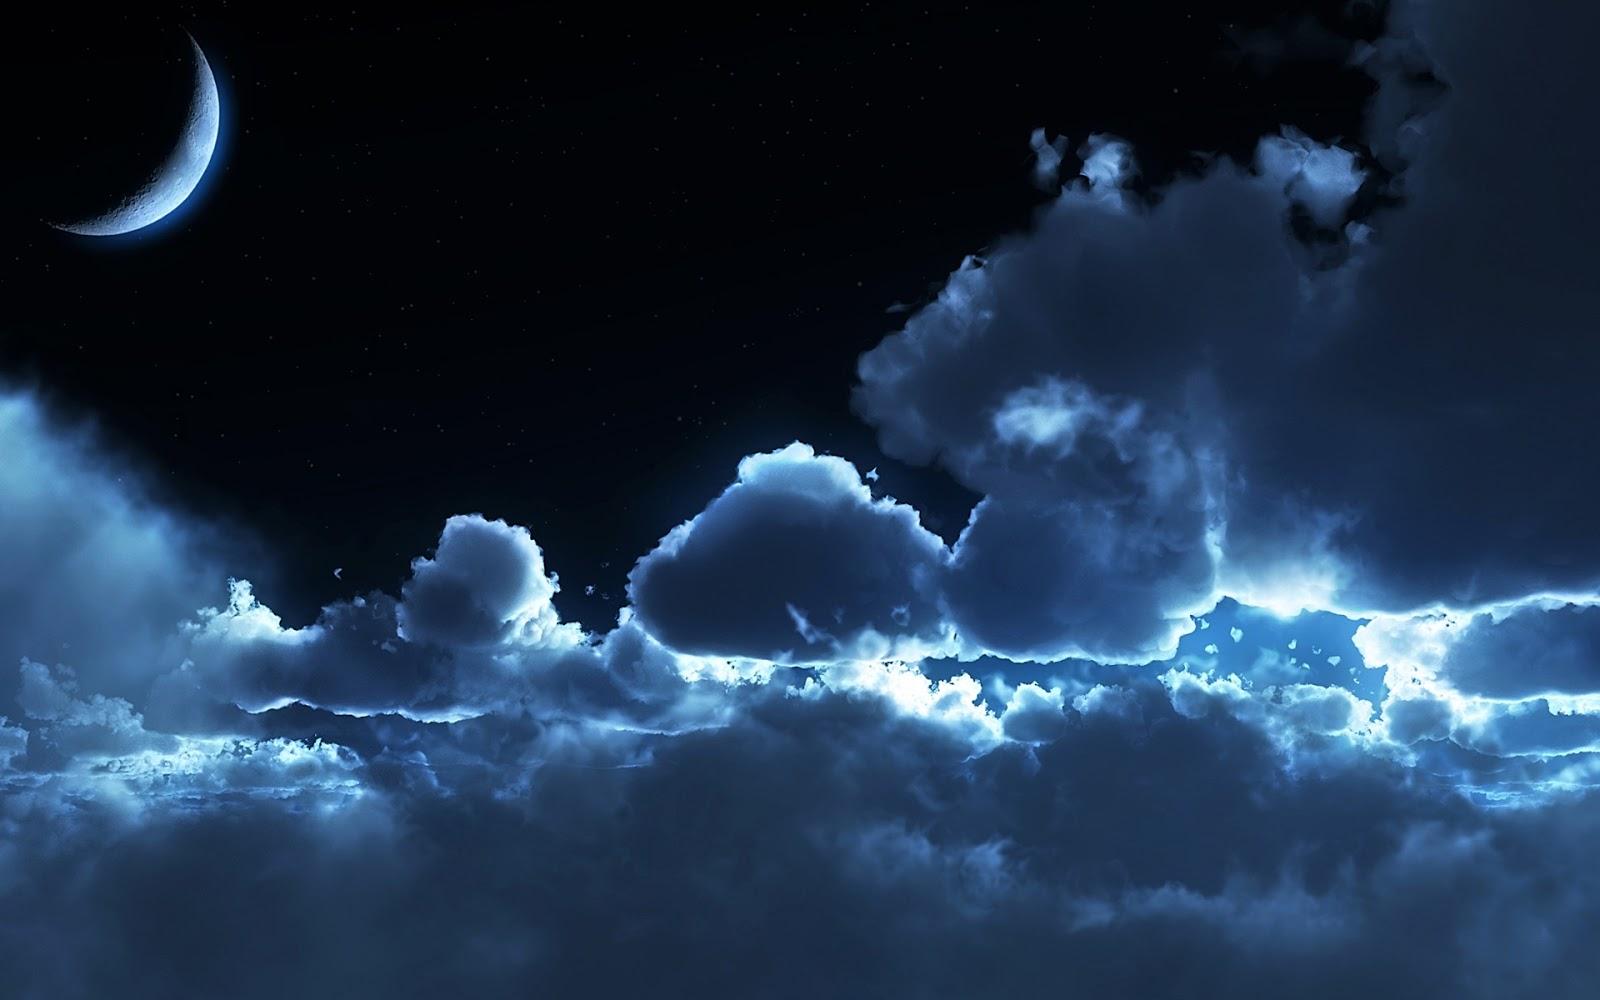 sky wallpaper for desktop - photo #29